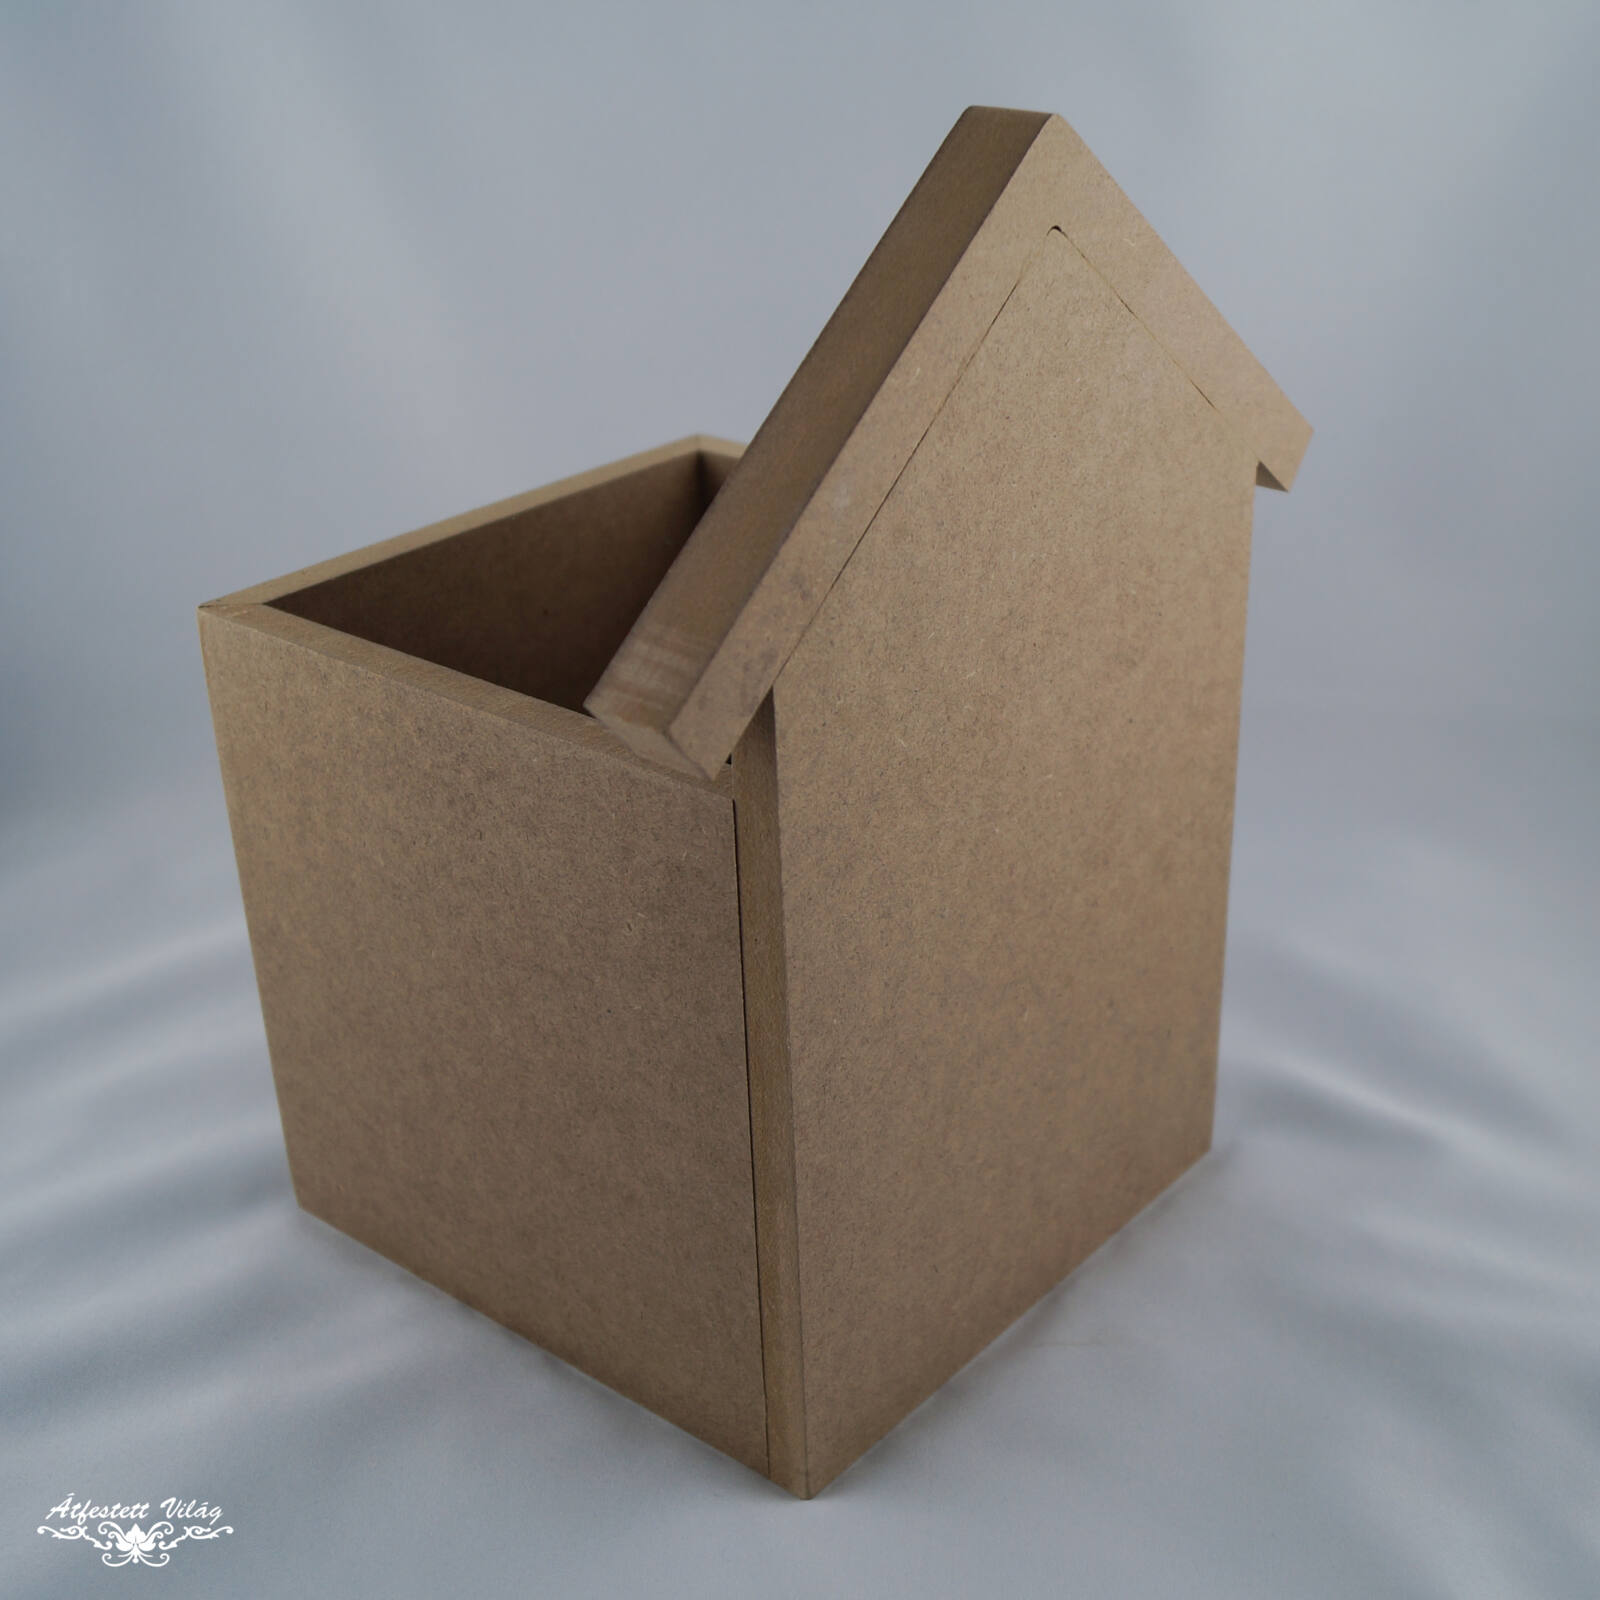 Házikó formájú doboz